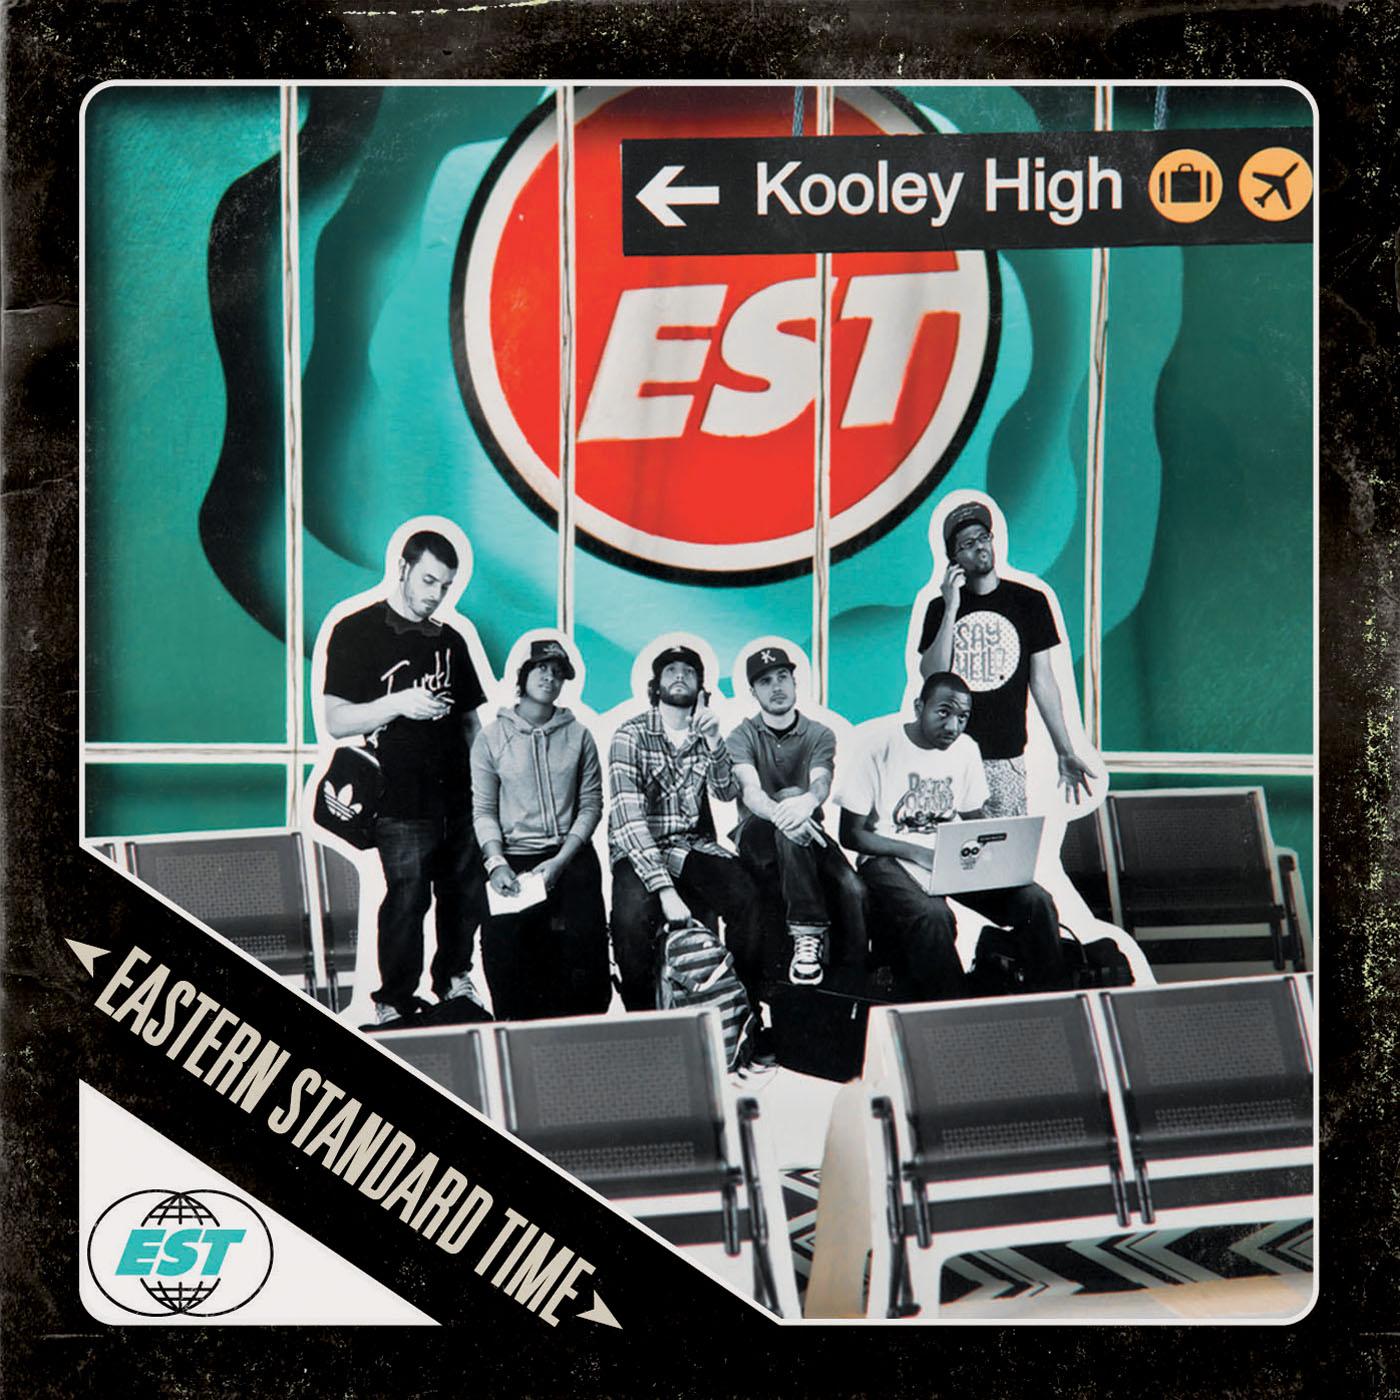 Kooley High - EST (Album Cover)